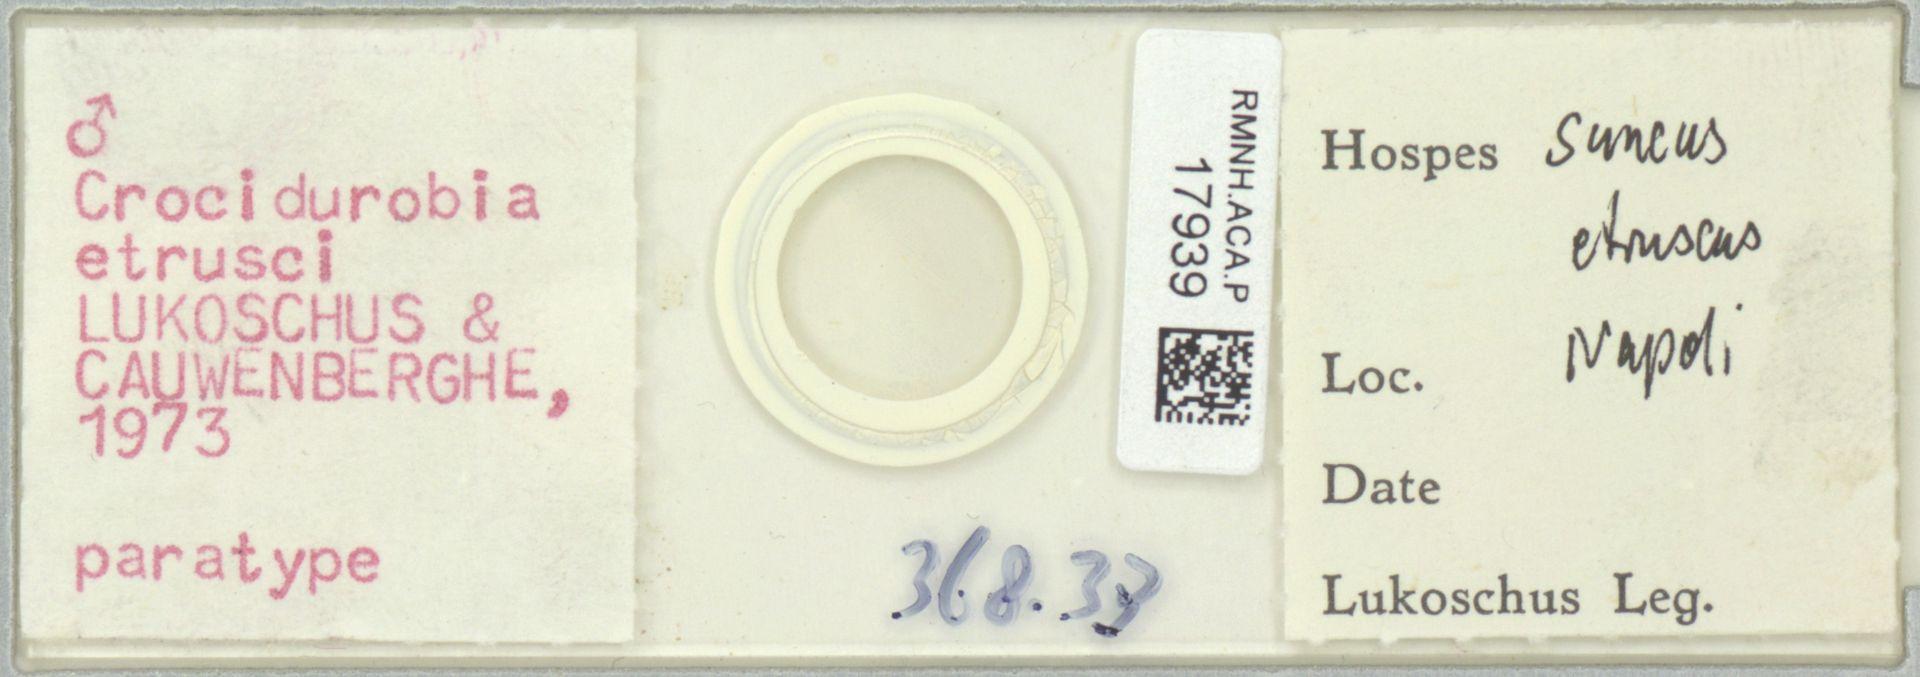 RMNH.ACA.P.17939 | Crocidurobia etrusci Lukoschus & Cauwenberghe, 1973